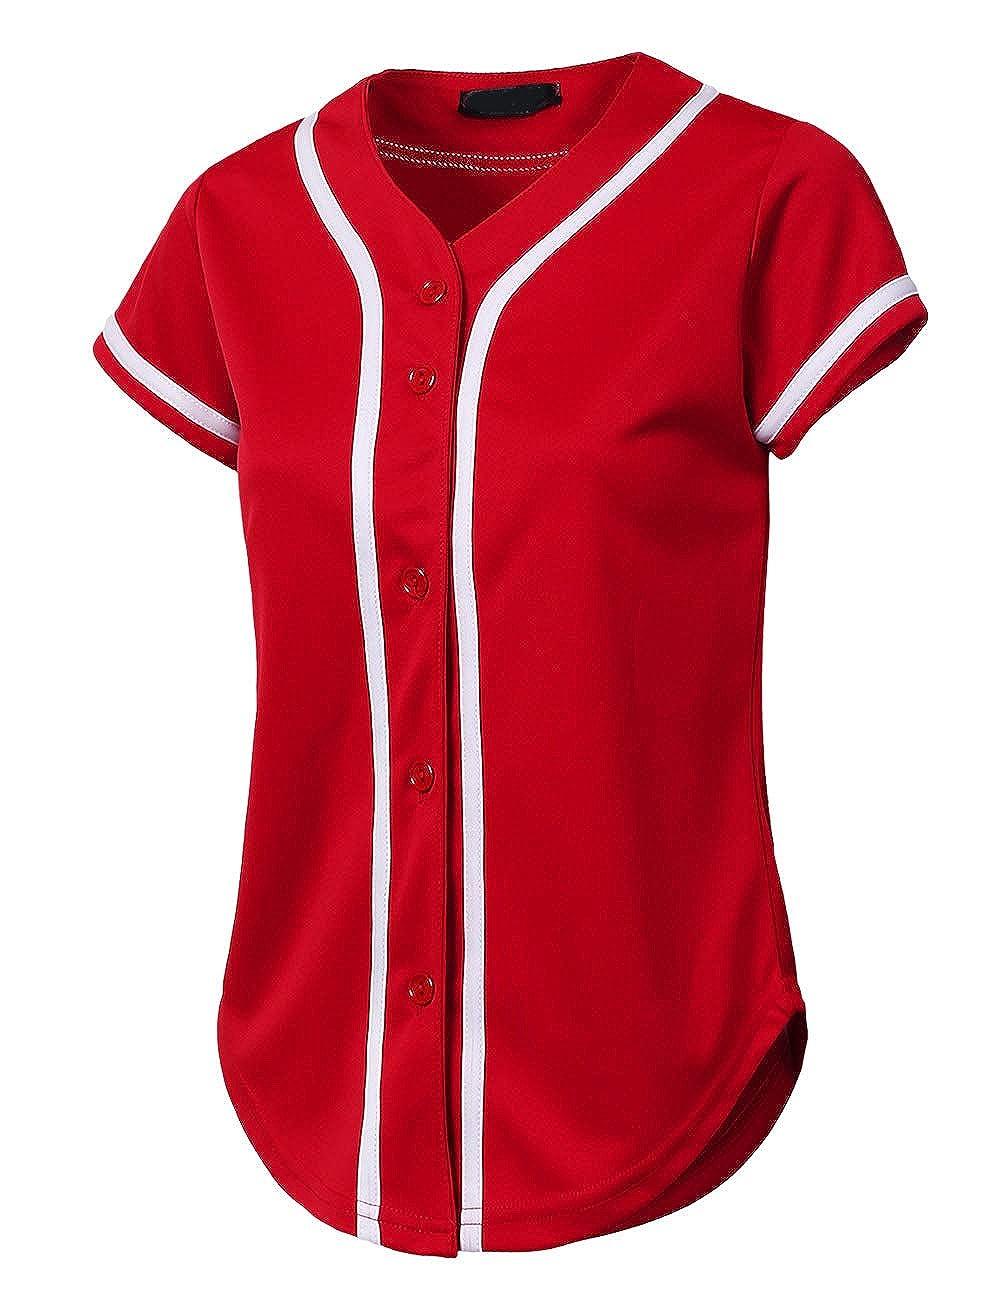 4cc36518cb0 Baseball Jersey Shirts Red - Nils Stucki Kieferorthopäde